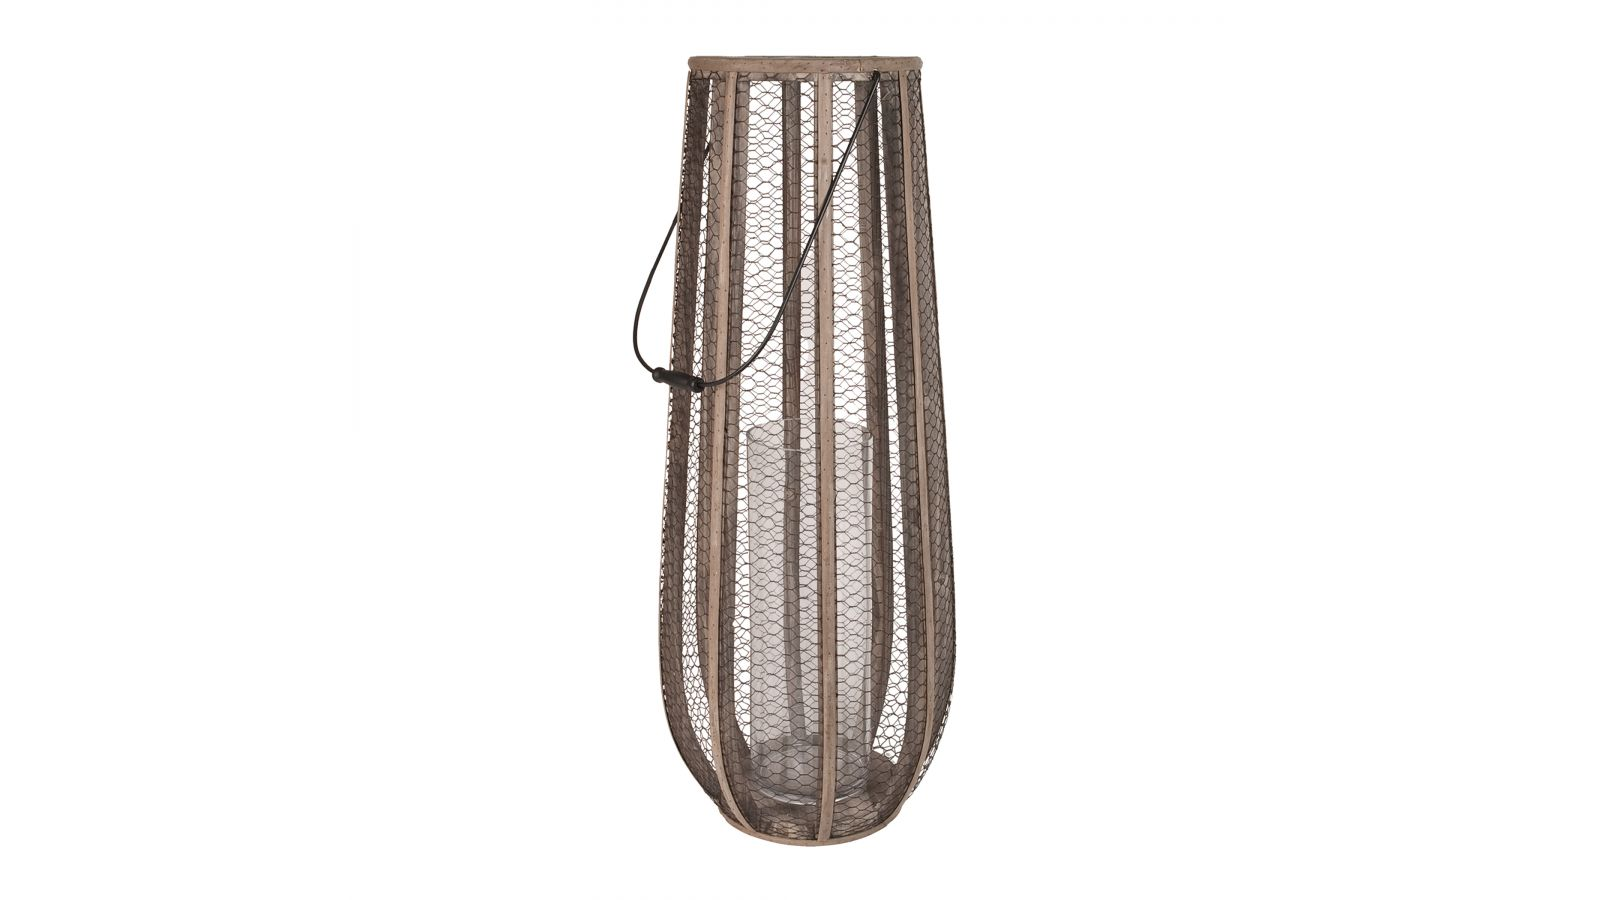 594029 - Slim Wire Atlas Hurricane Vase